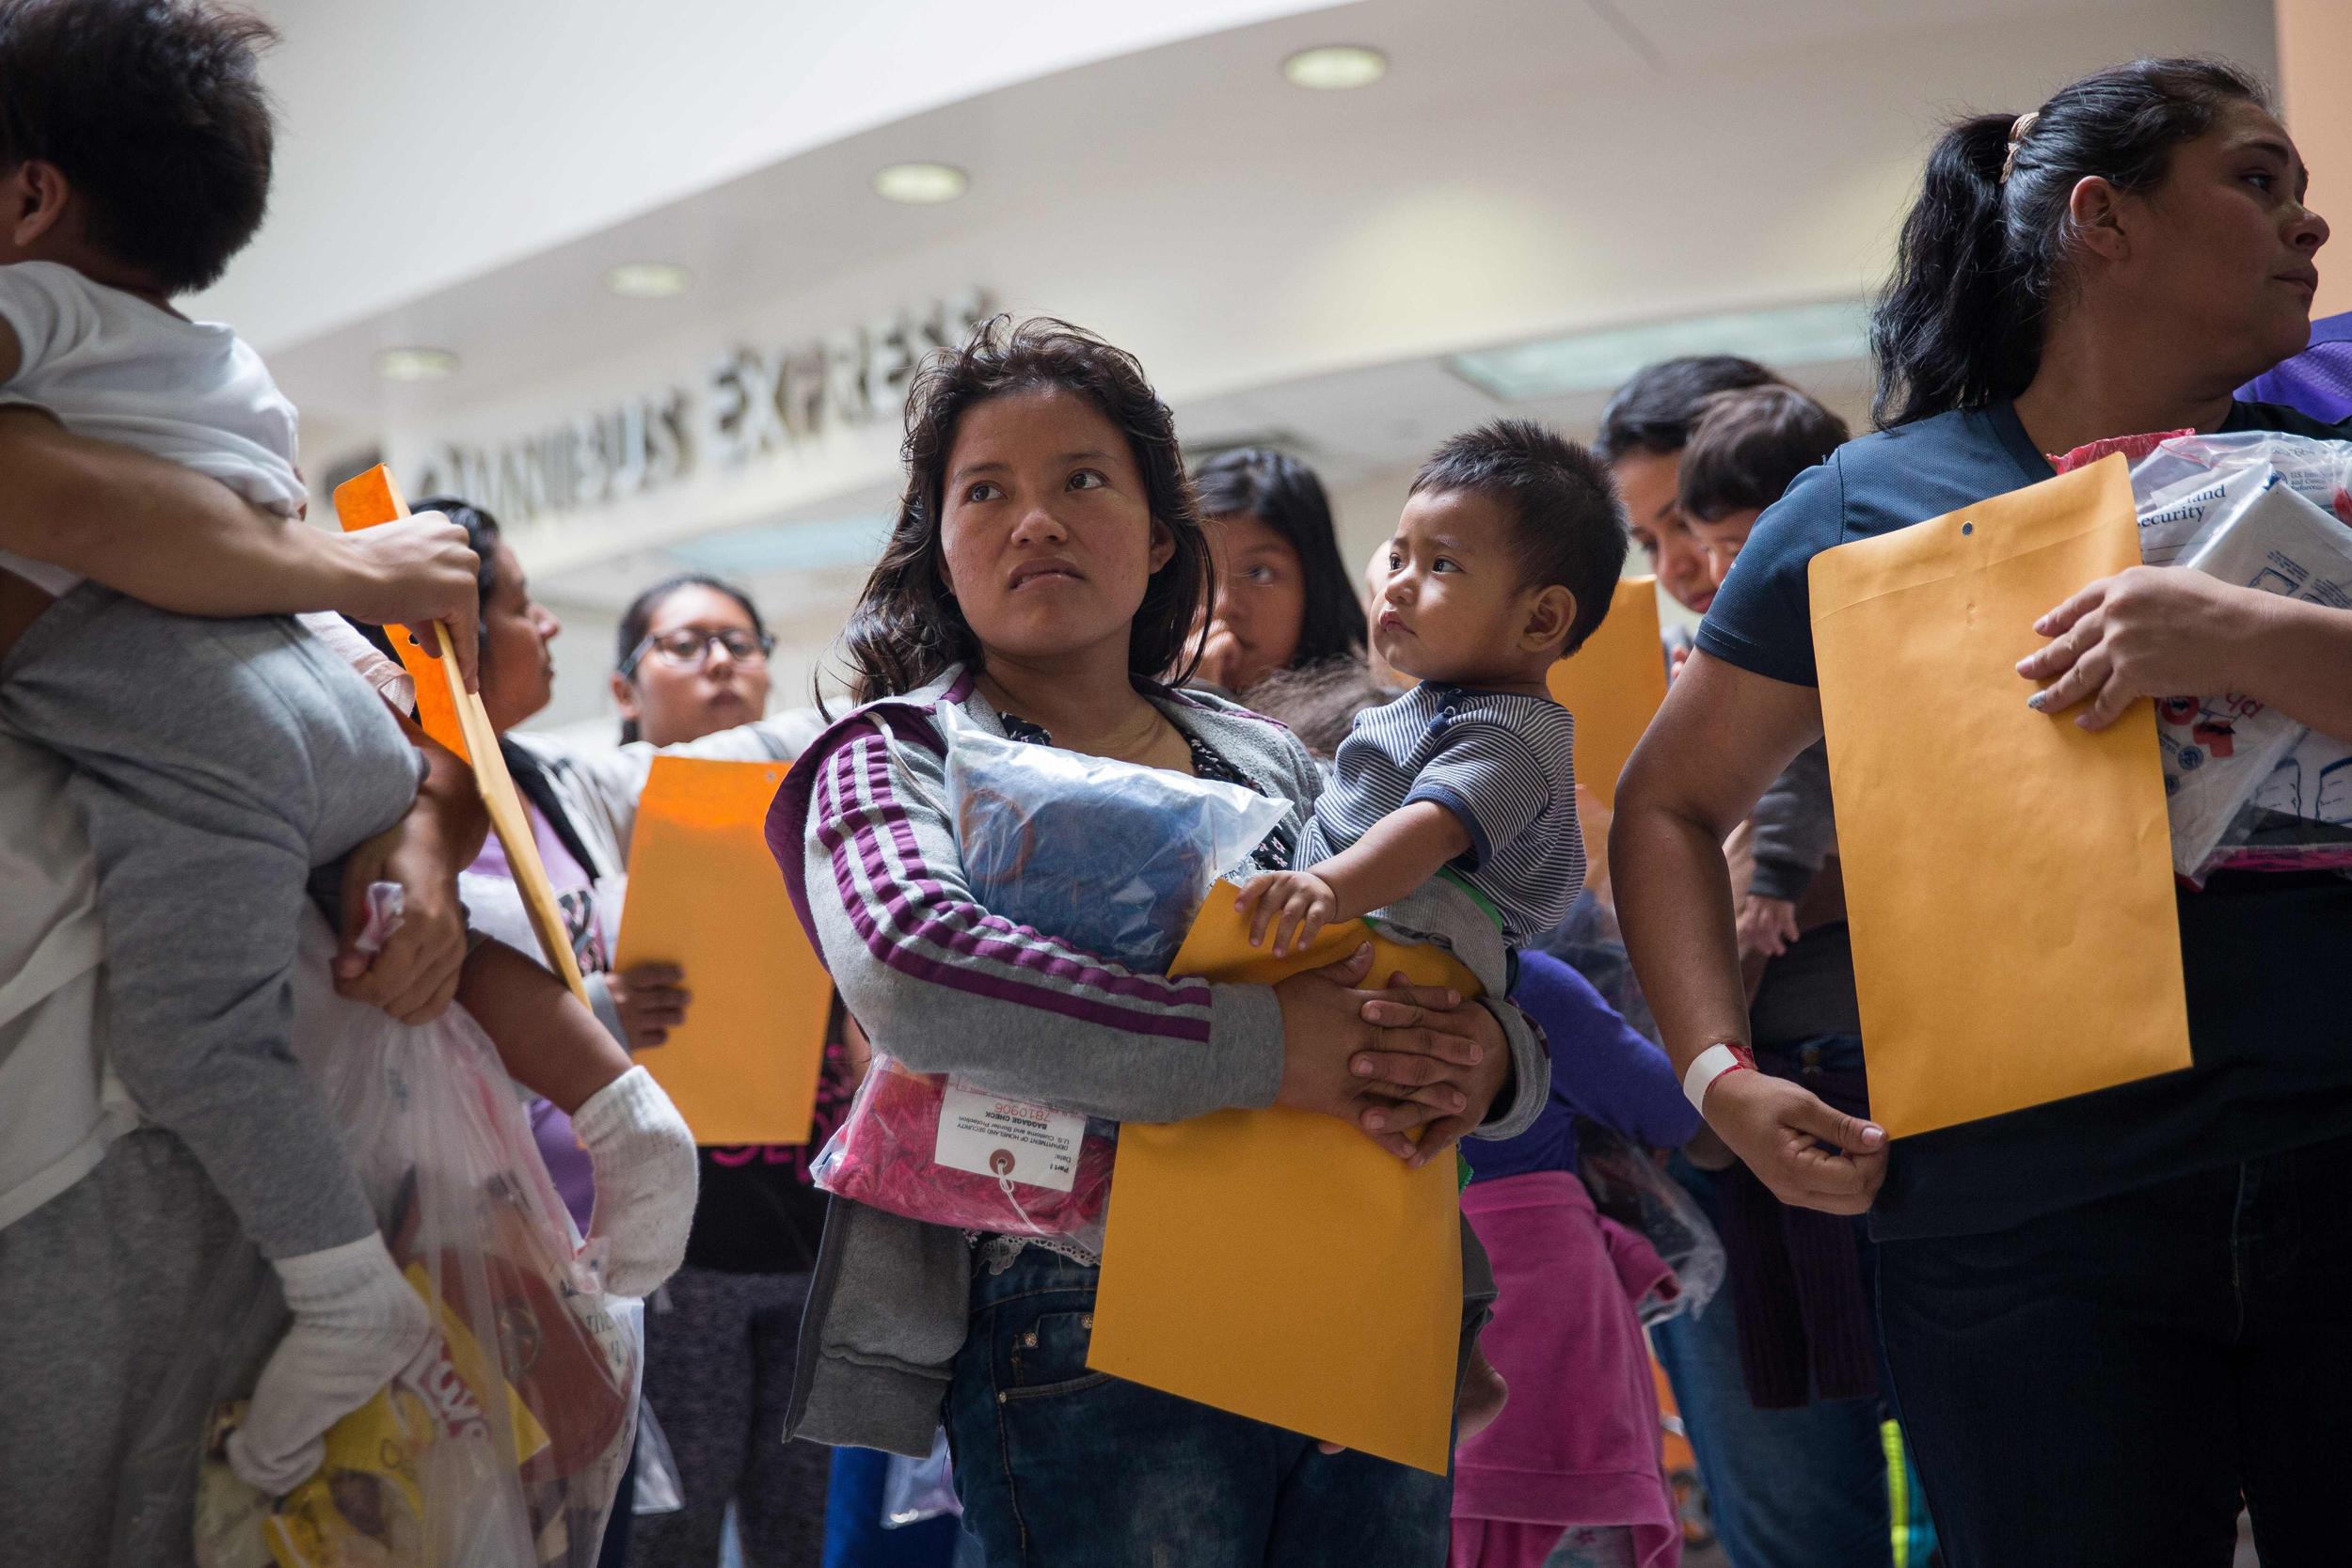 The families who slip through Trump's zero-tolerance border policy